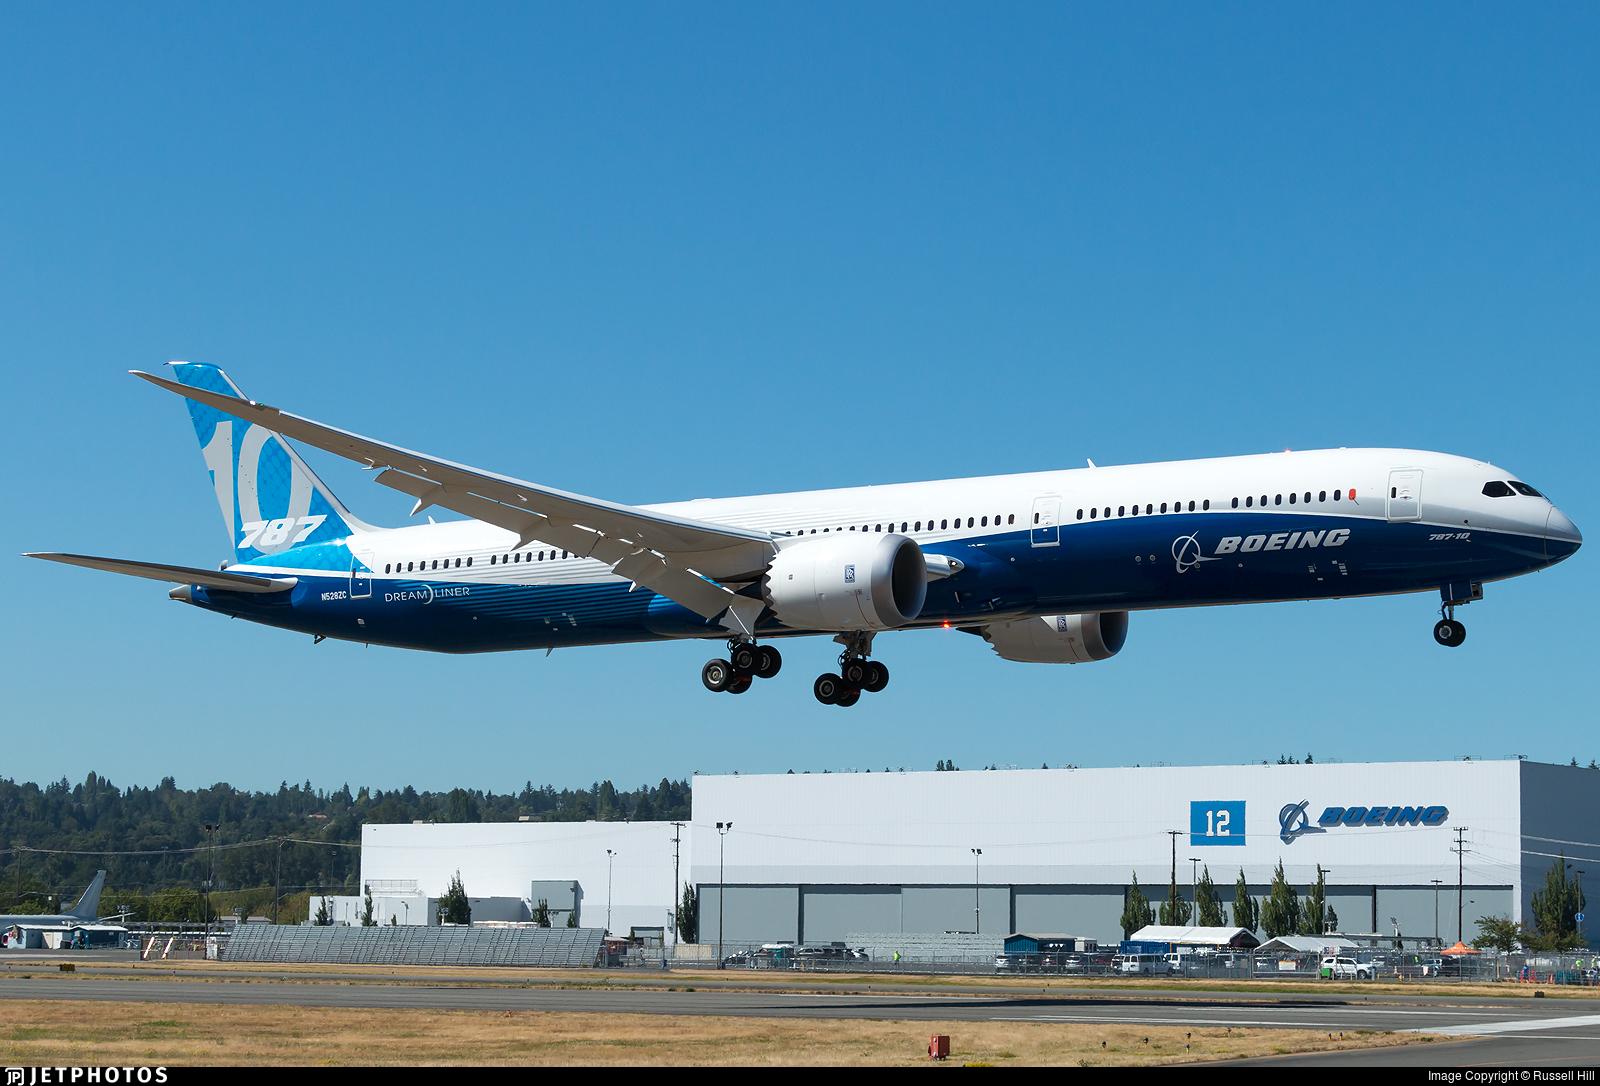 787 10 Dreamliner >> N528zc Boeing 787 10 Dreamliner Boeing Company Russell Hill